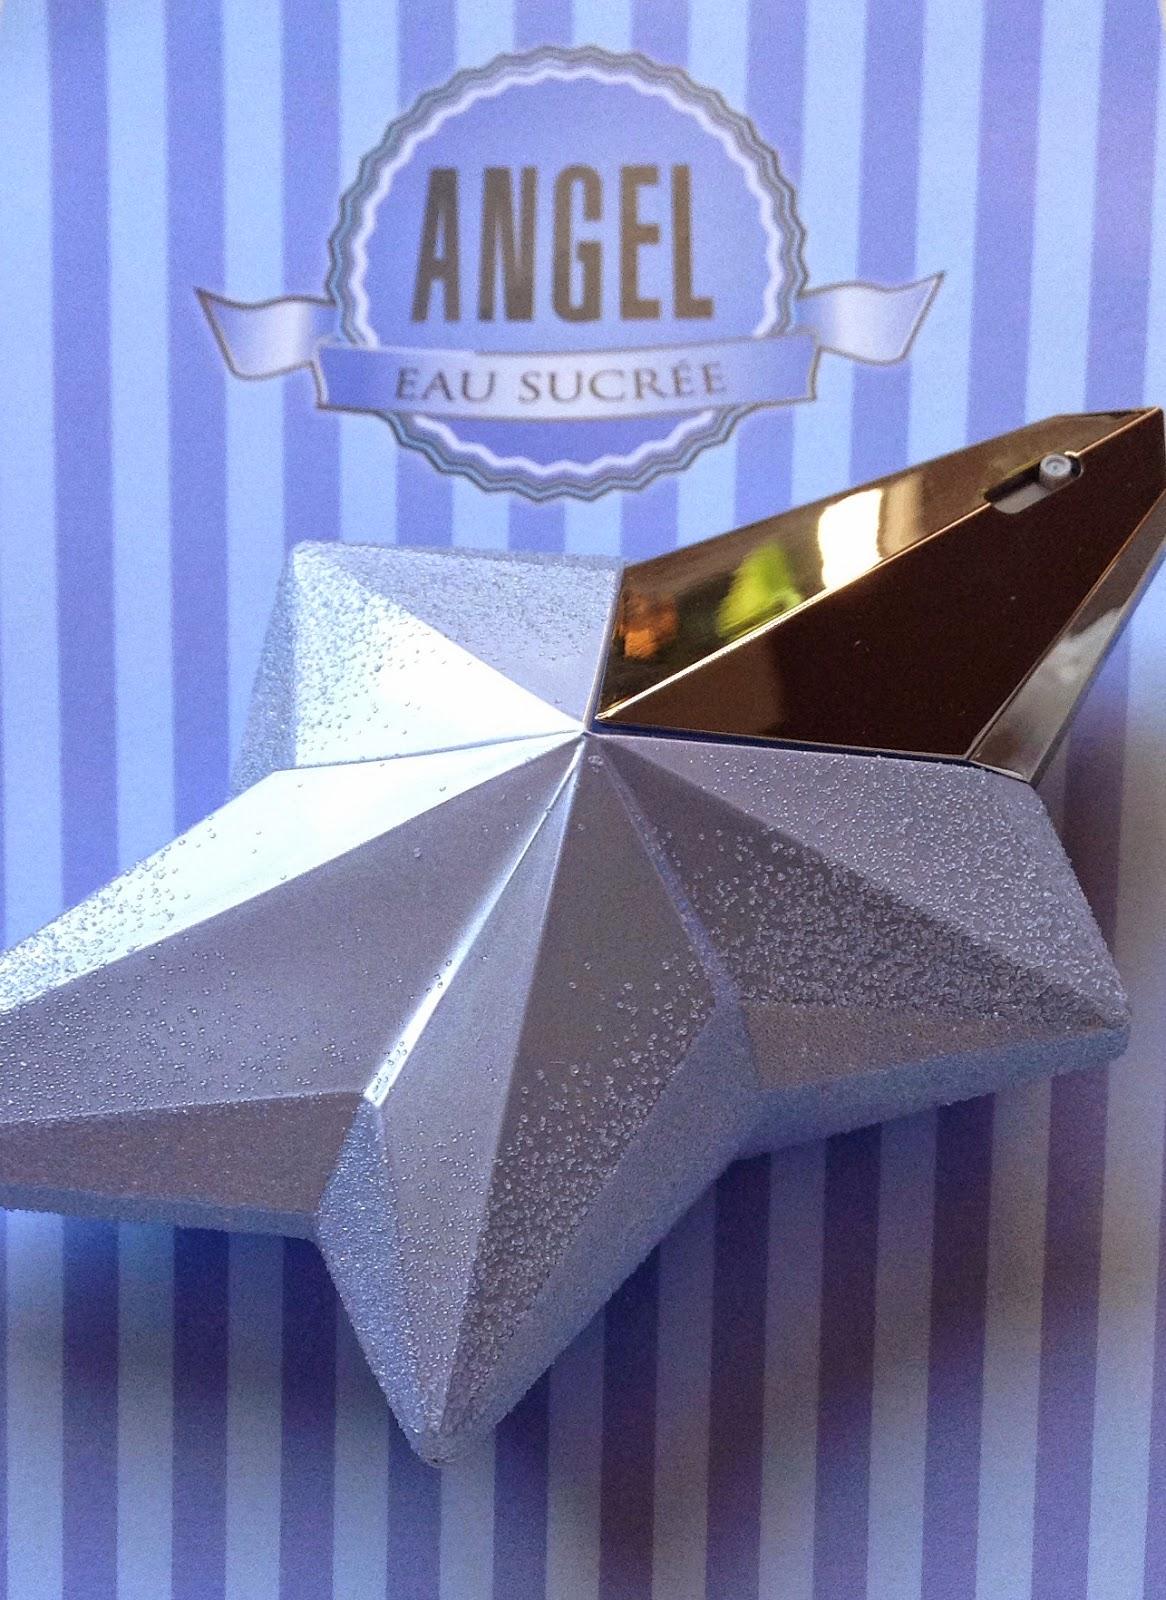 9. Thierry Mugler Angel Eau Sucree